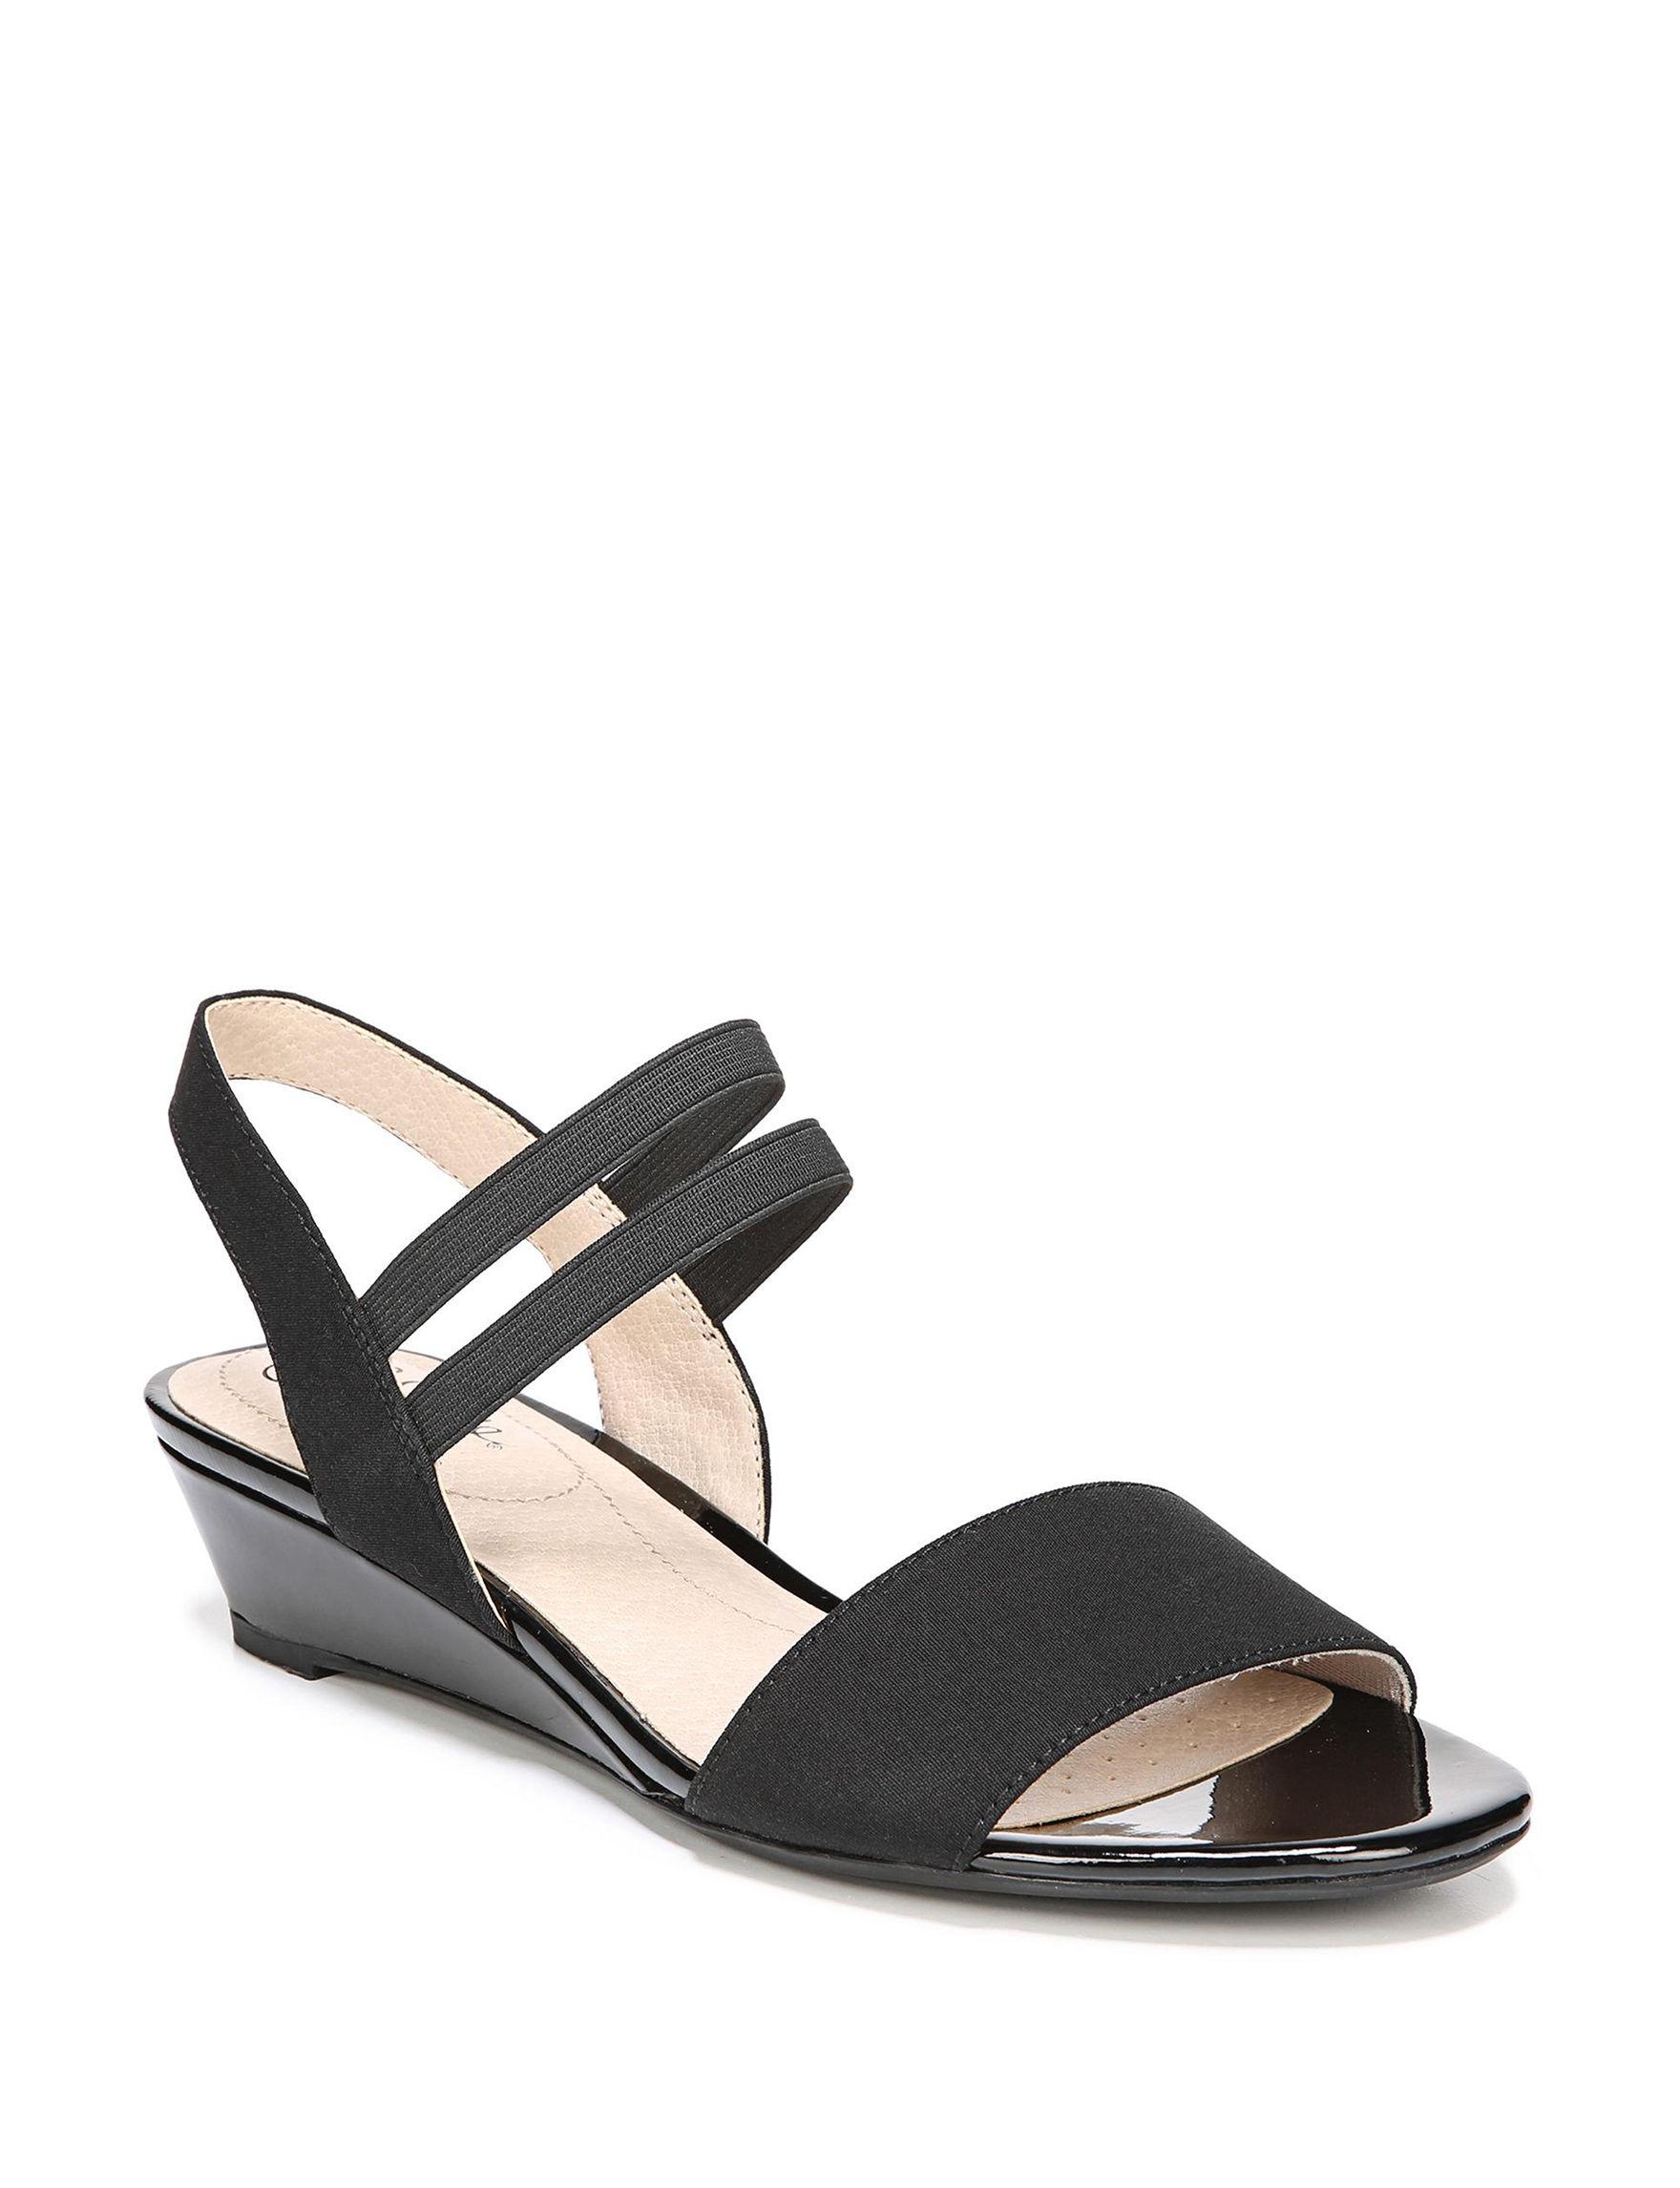 Lifestride Black Wedge Sandals